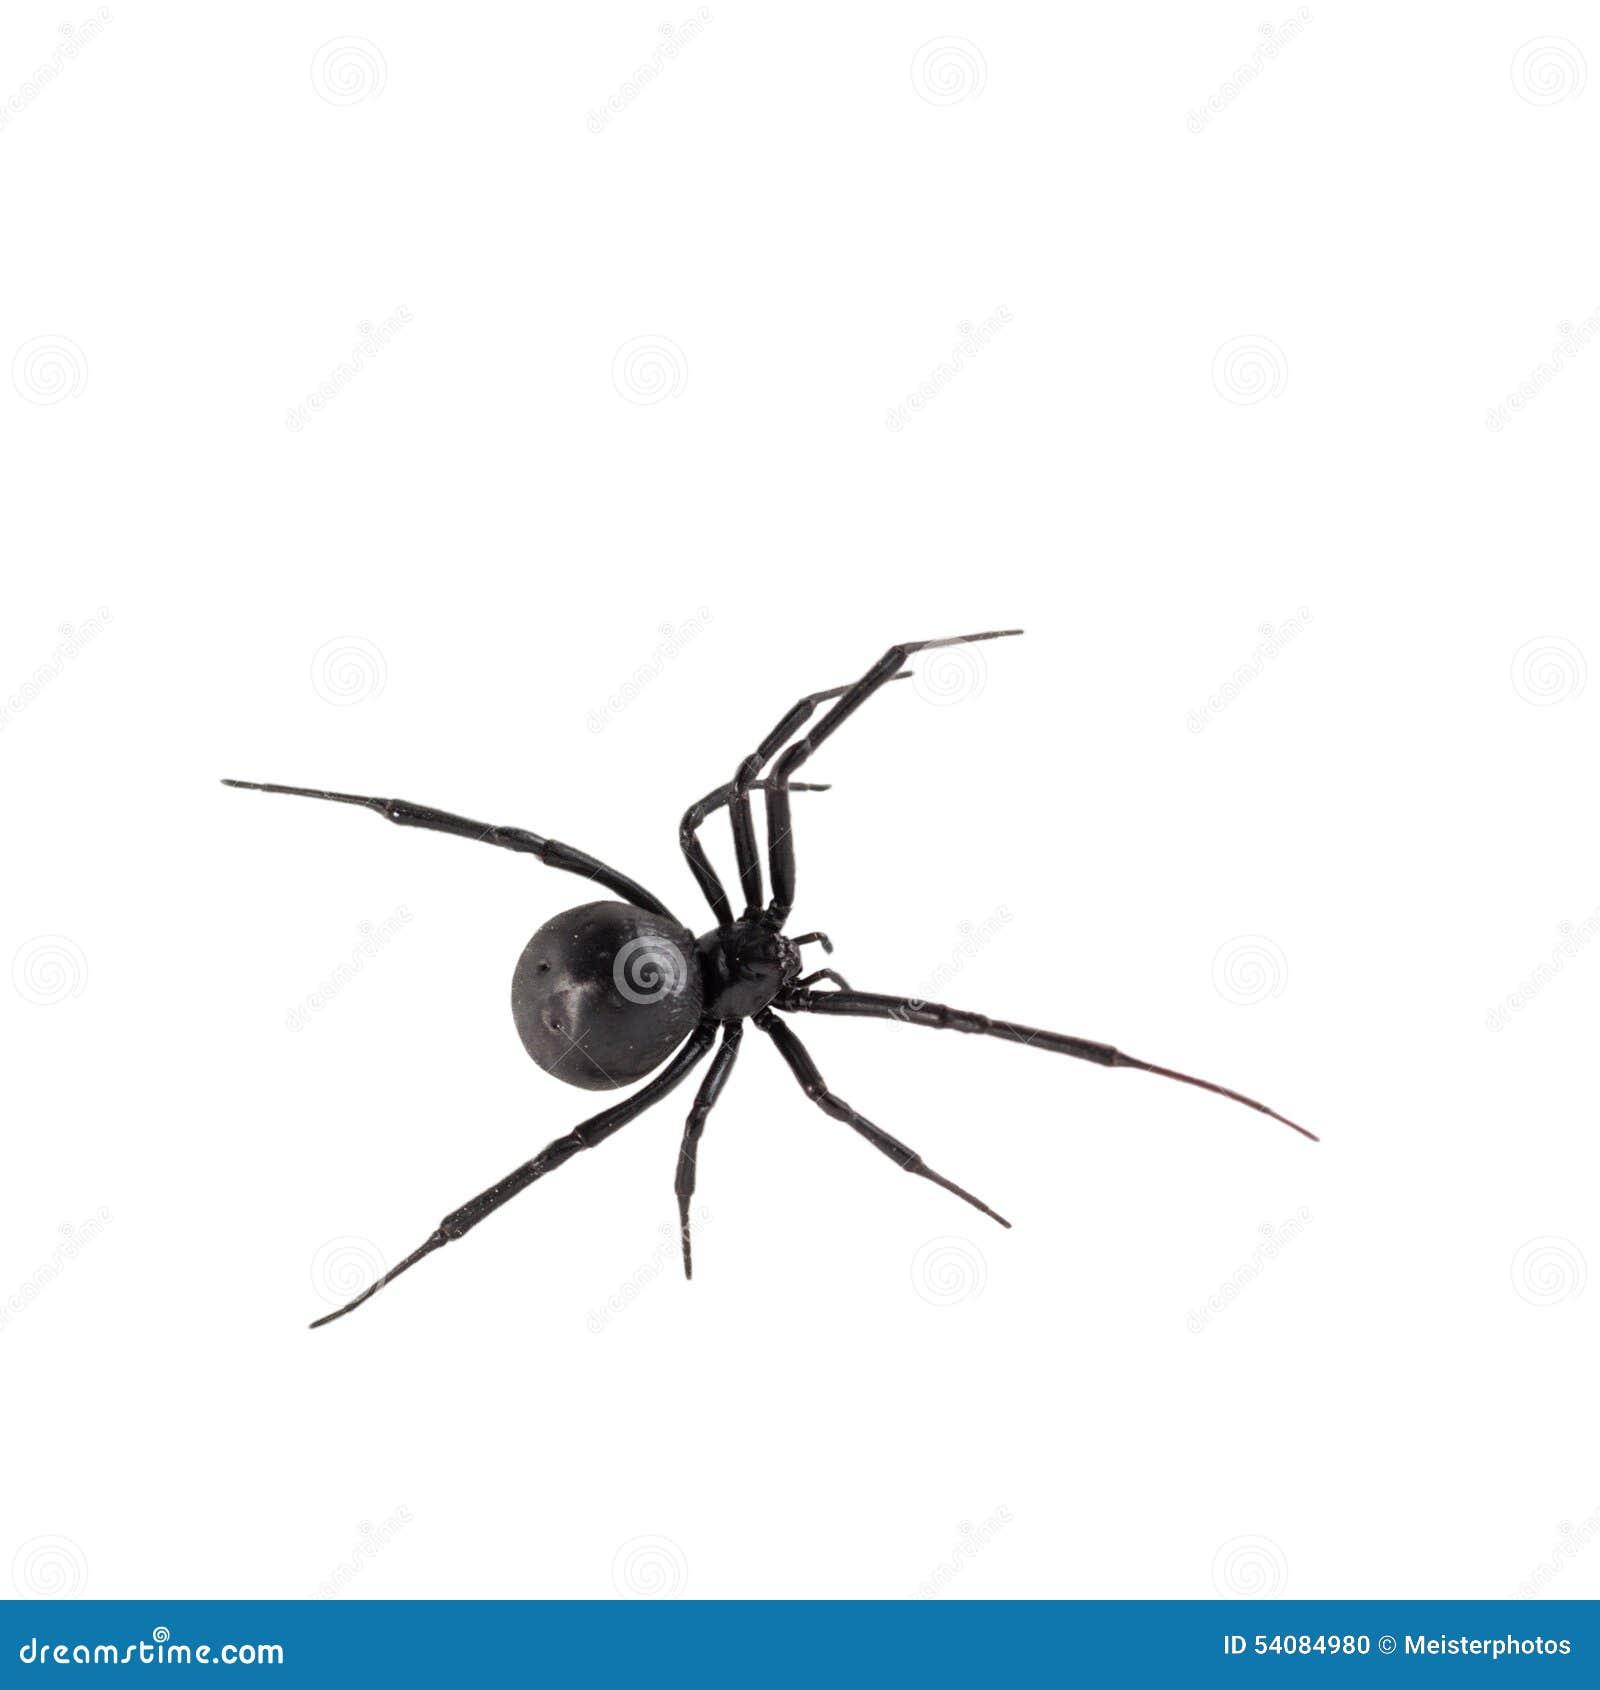 Female Black Widow Spider Stock Photo - Image: 54084980